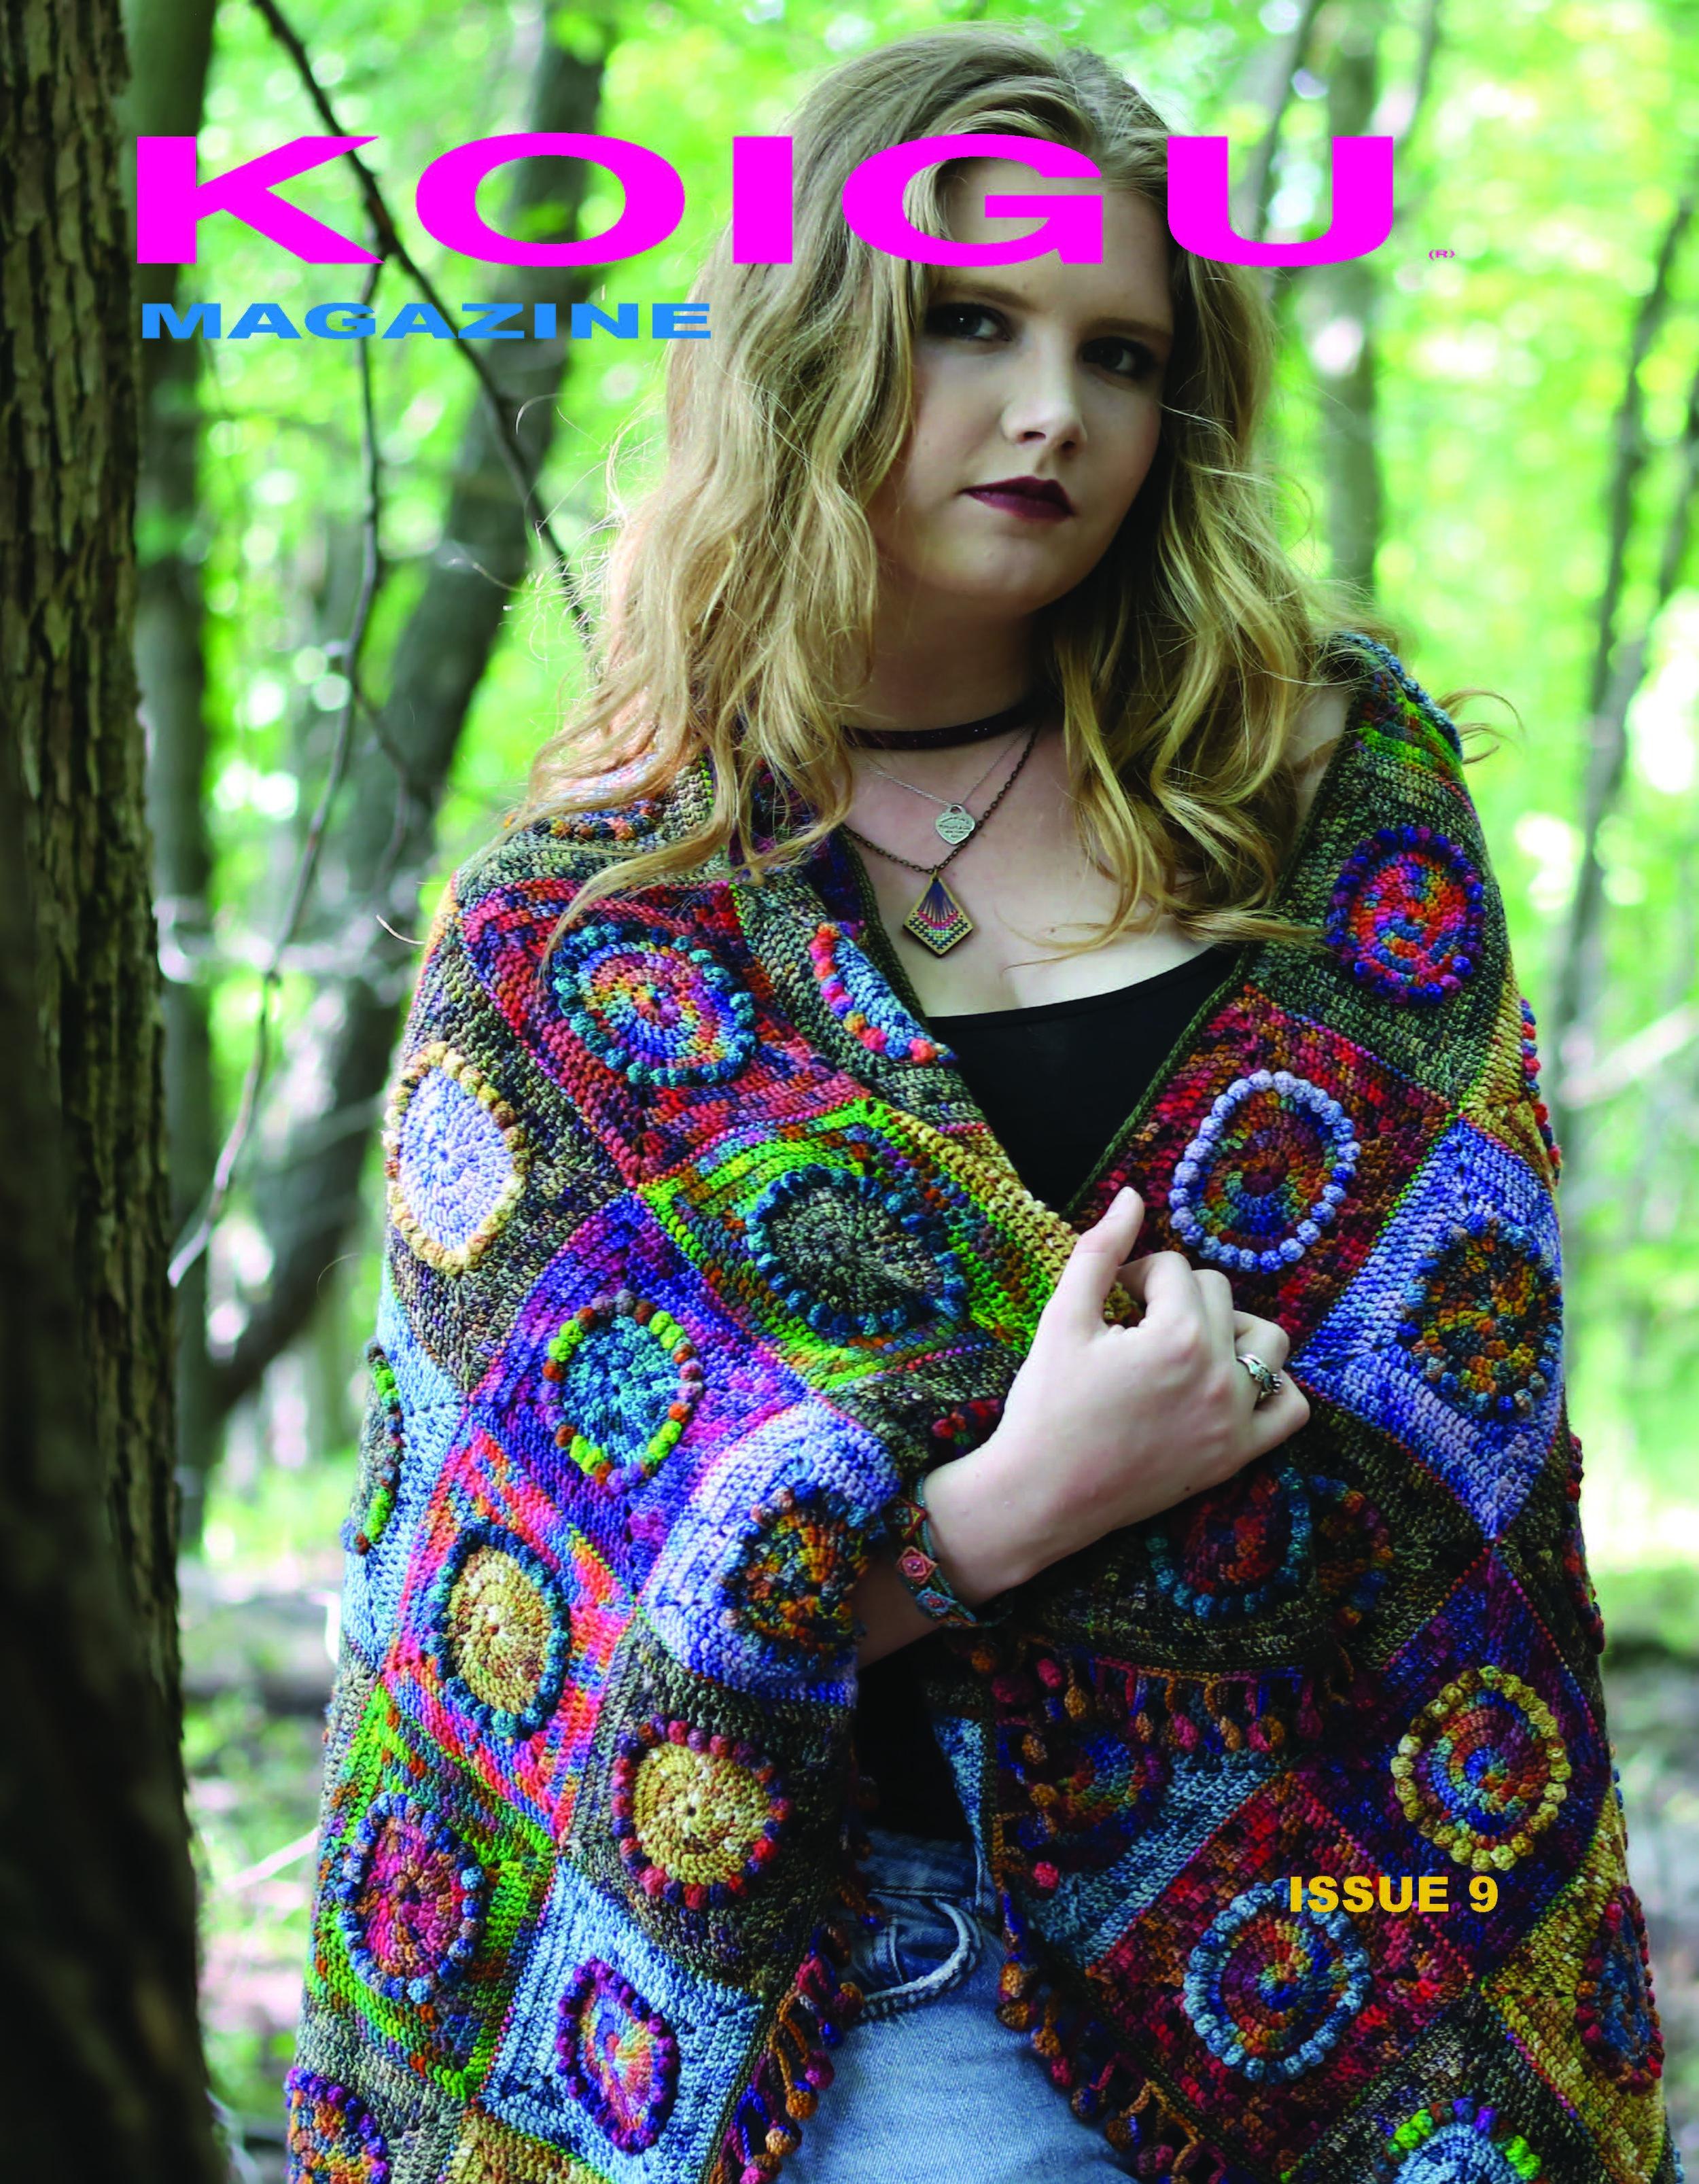 koigu magazine 9 cover sm.jpg